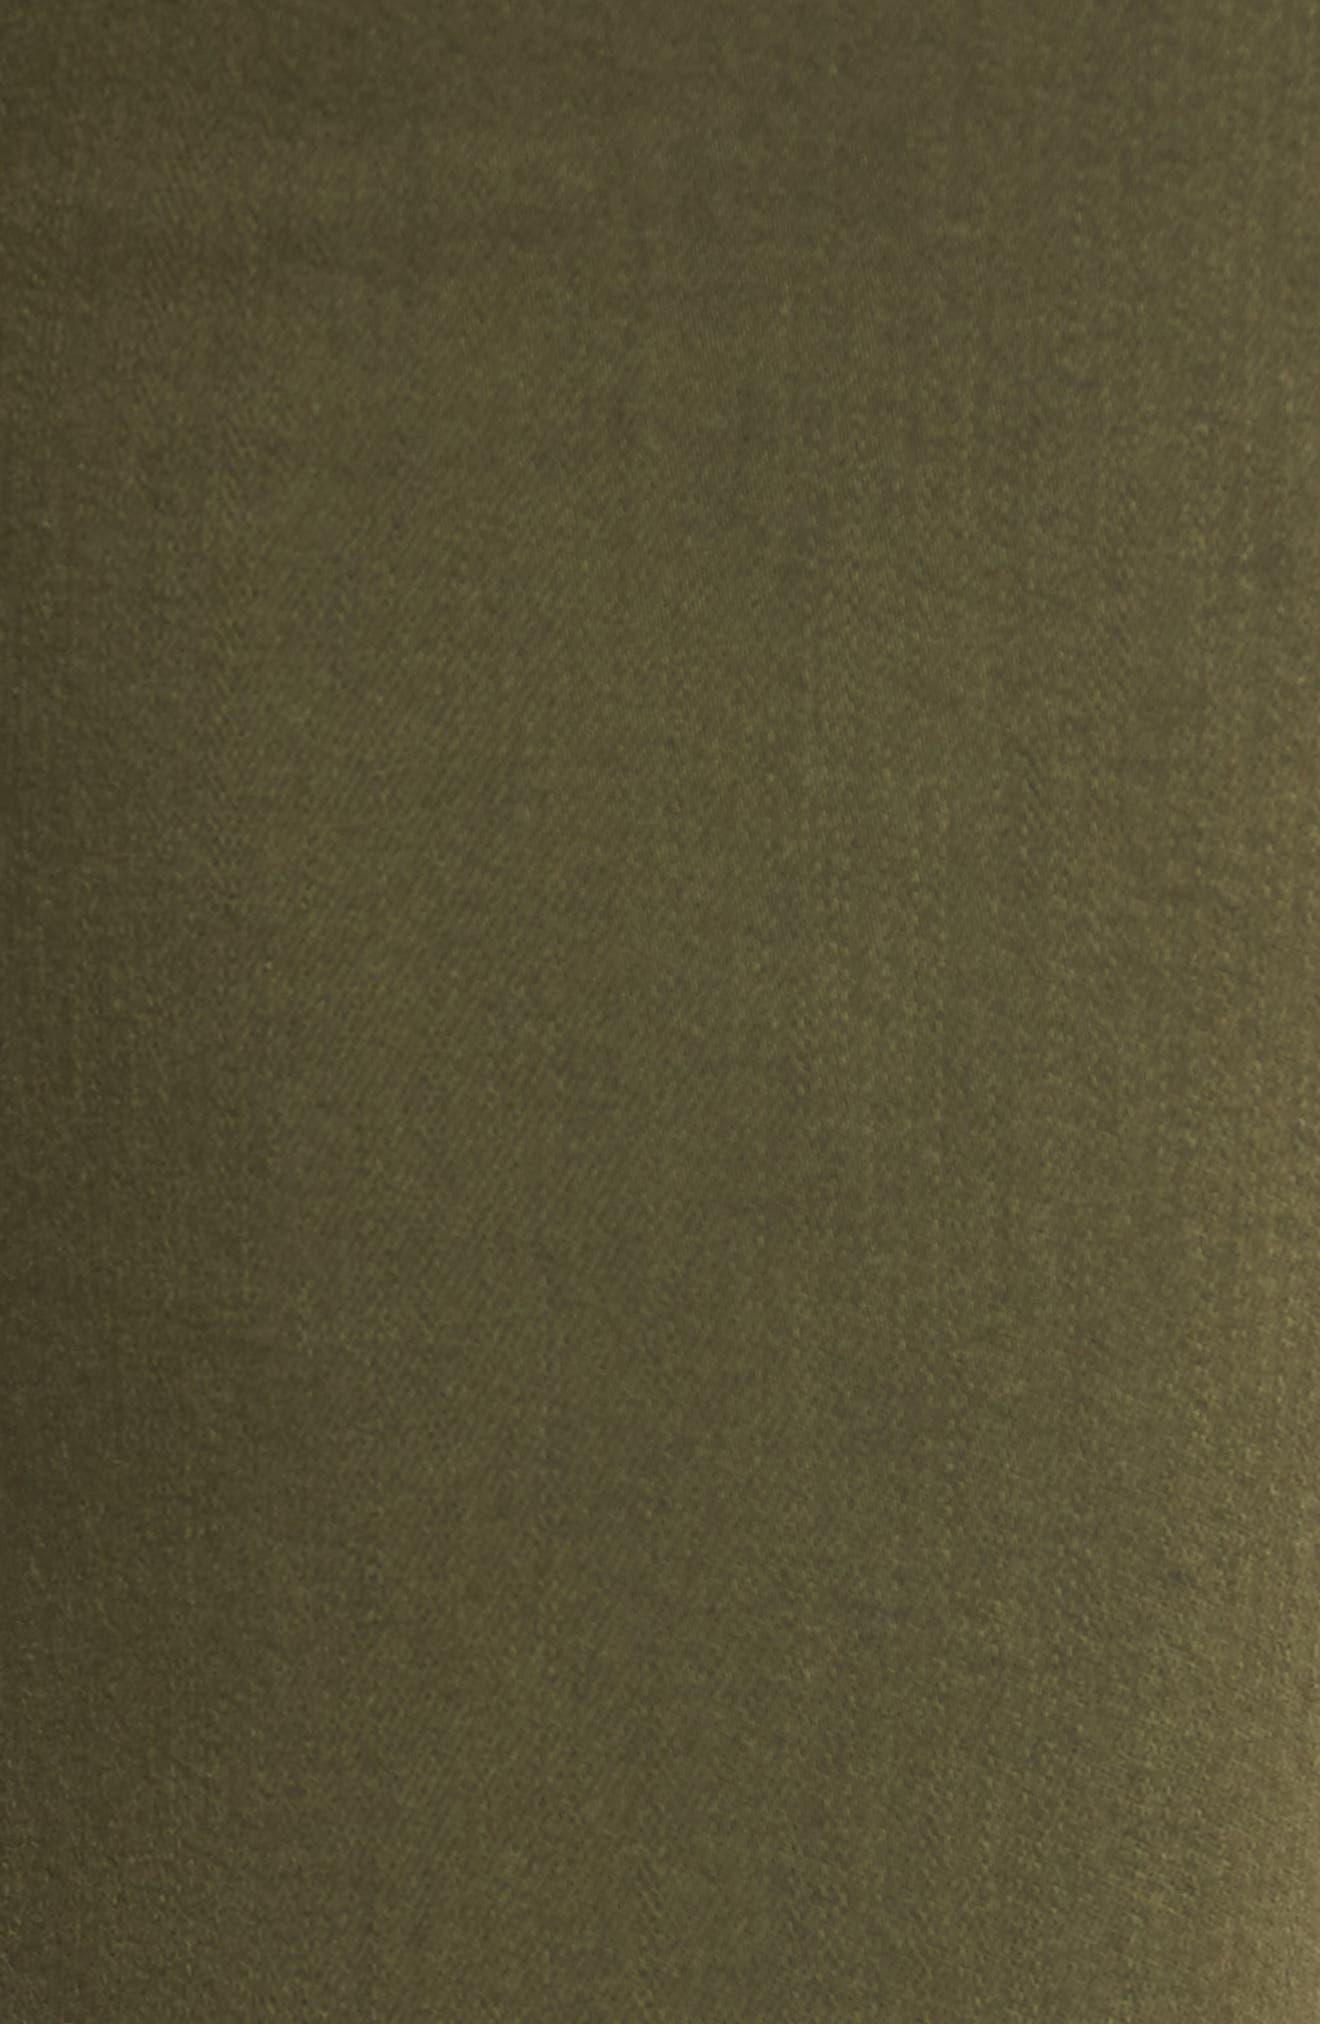 High Waist Skinny Jeans,                             Alternate thumbnail 5, color,                             300